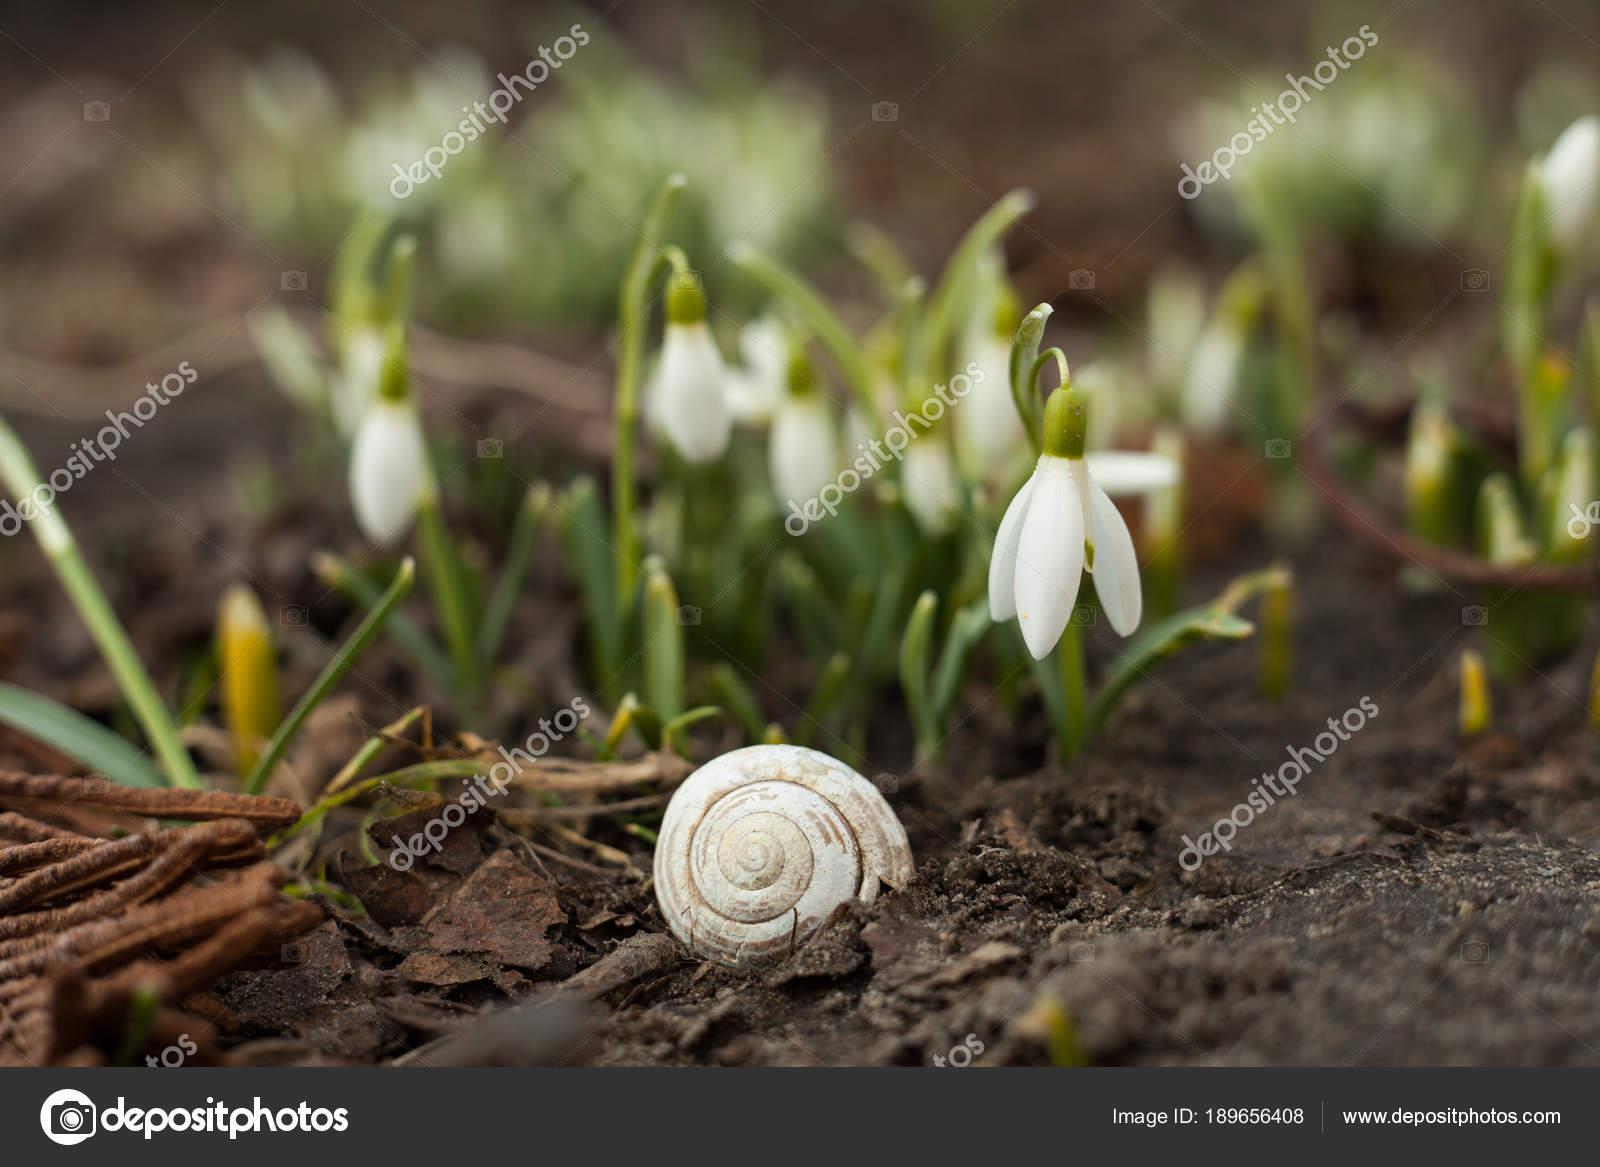 White Snowdrop Bell Empty Snail Shell Flower Shape Small Bell